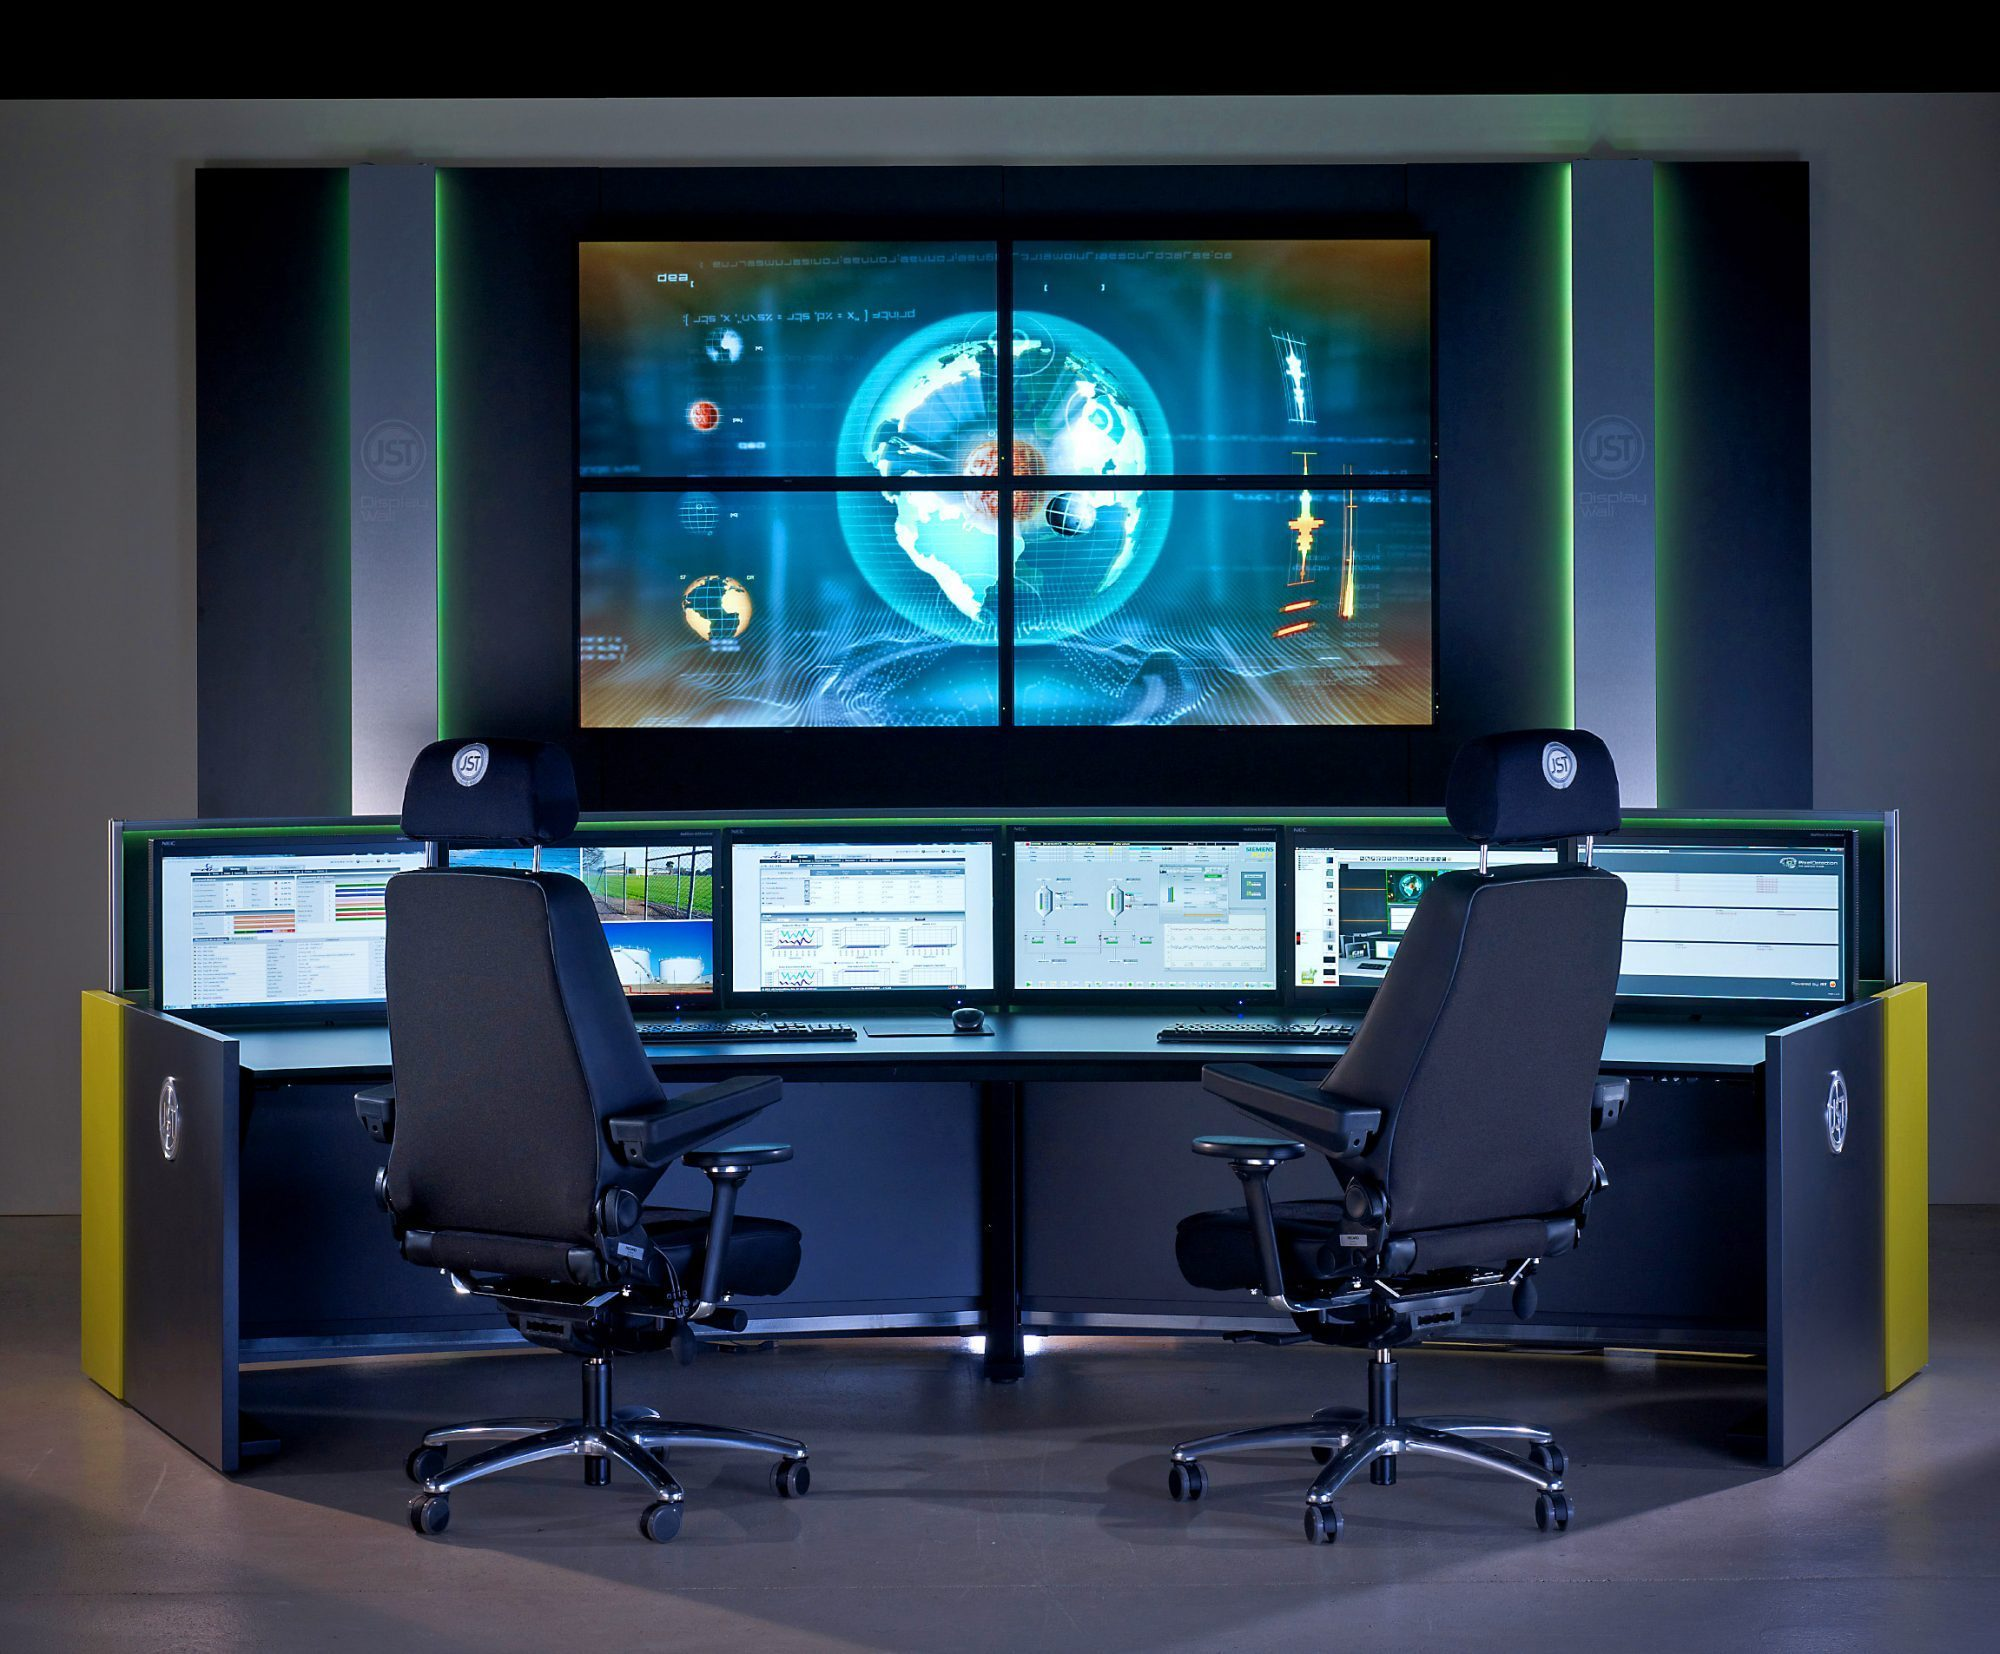 Control center furniture – Stratos X11 for 24/7 service from JST Jungmann